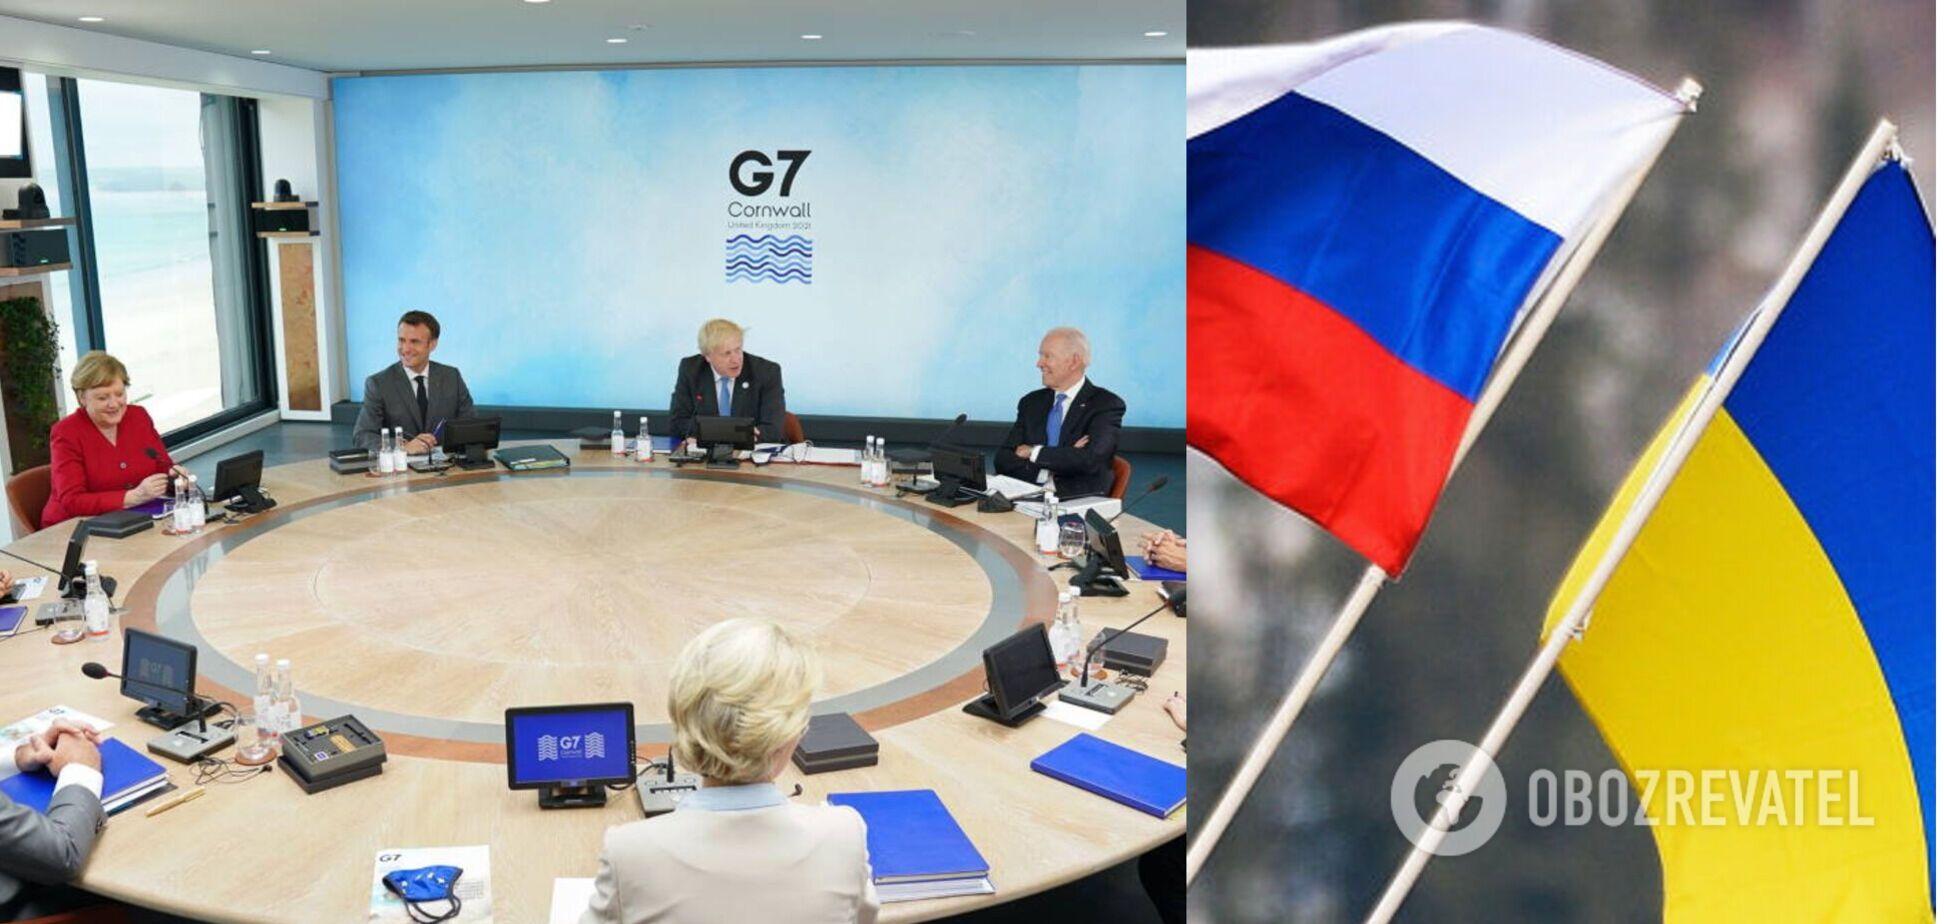 На саммите G7 поддержали Украину и обсудили угрозу РФ